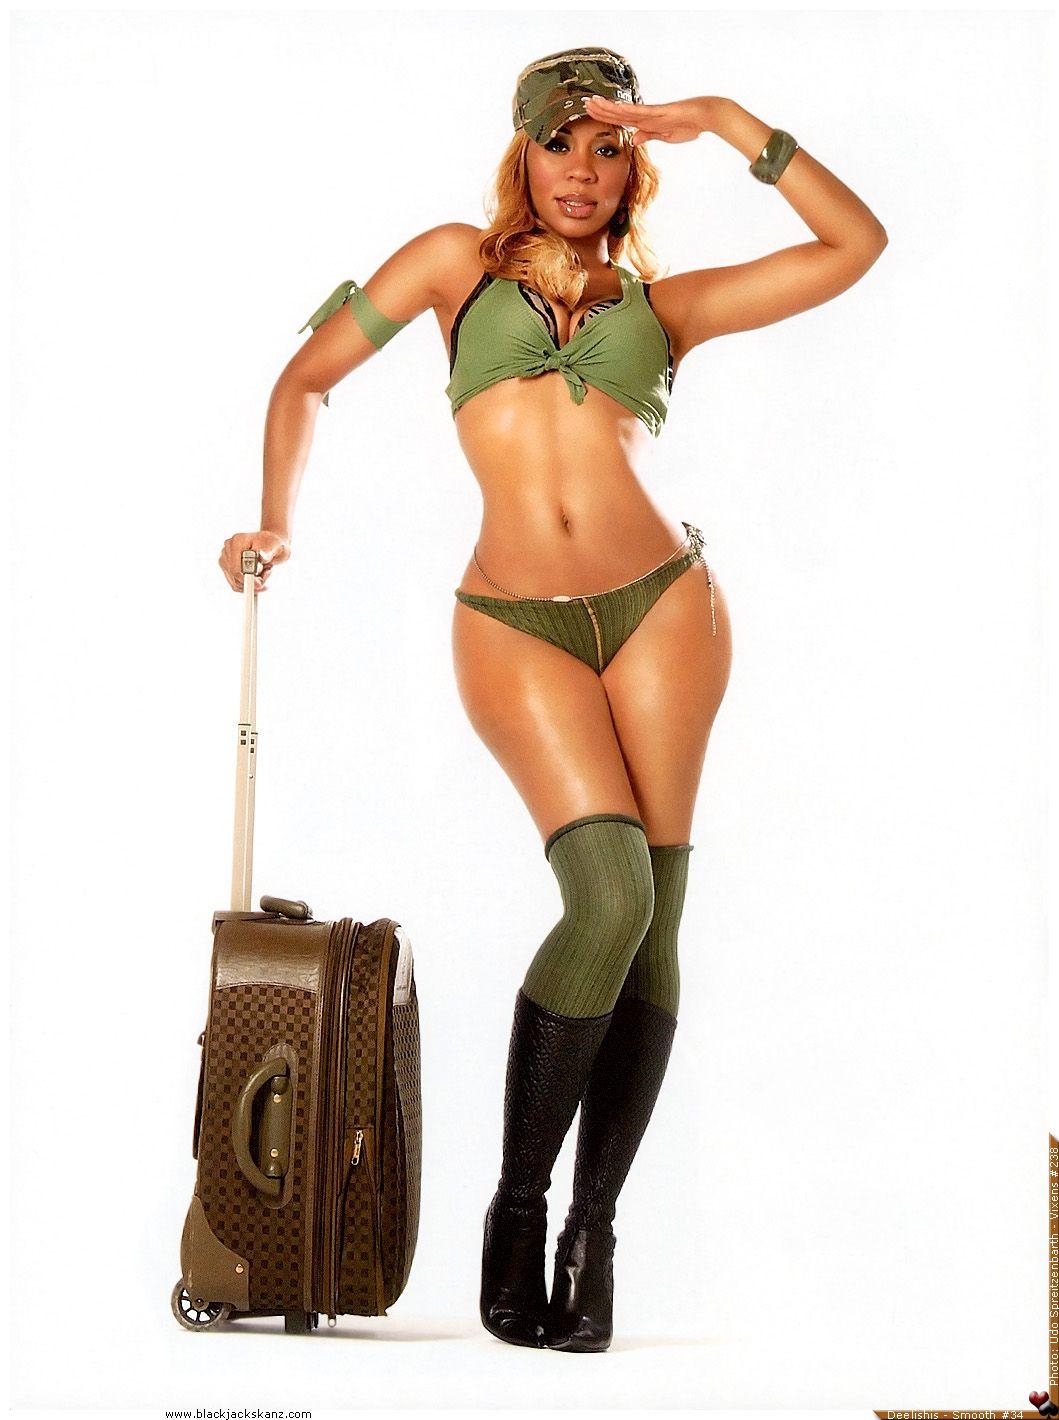 Chandra Davis (aka Deelishis) nude (87 photo), Topless, Hot, Boobs, braless 2015